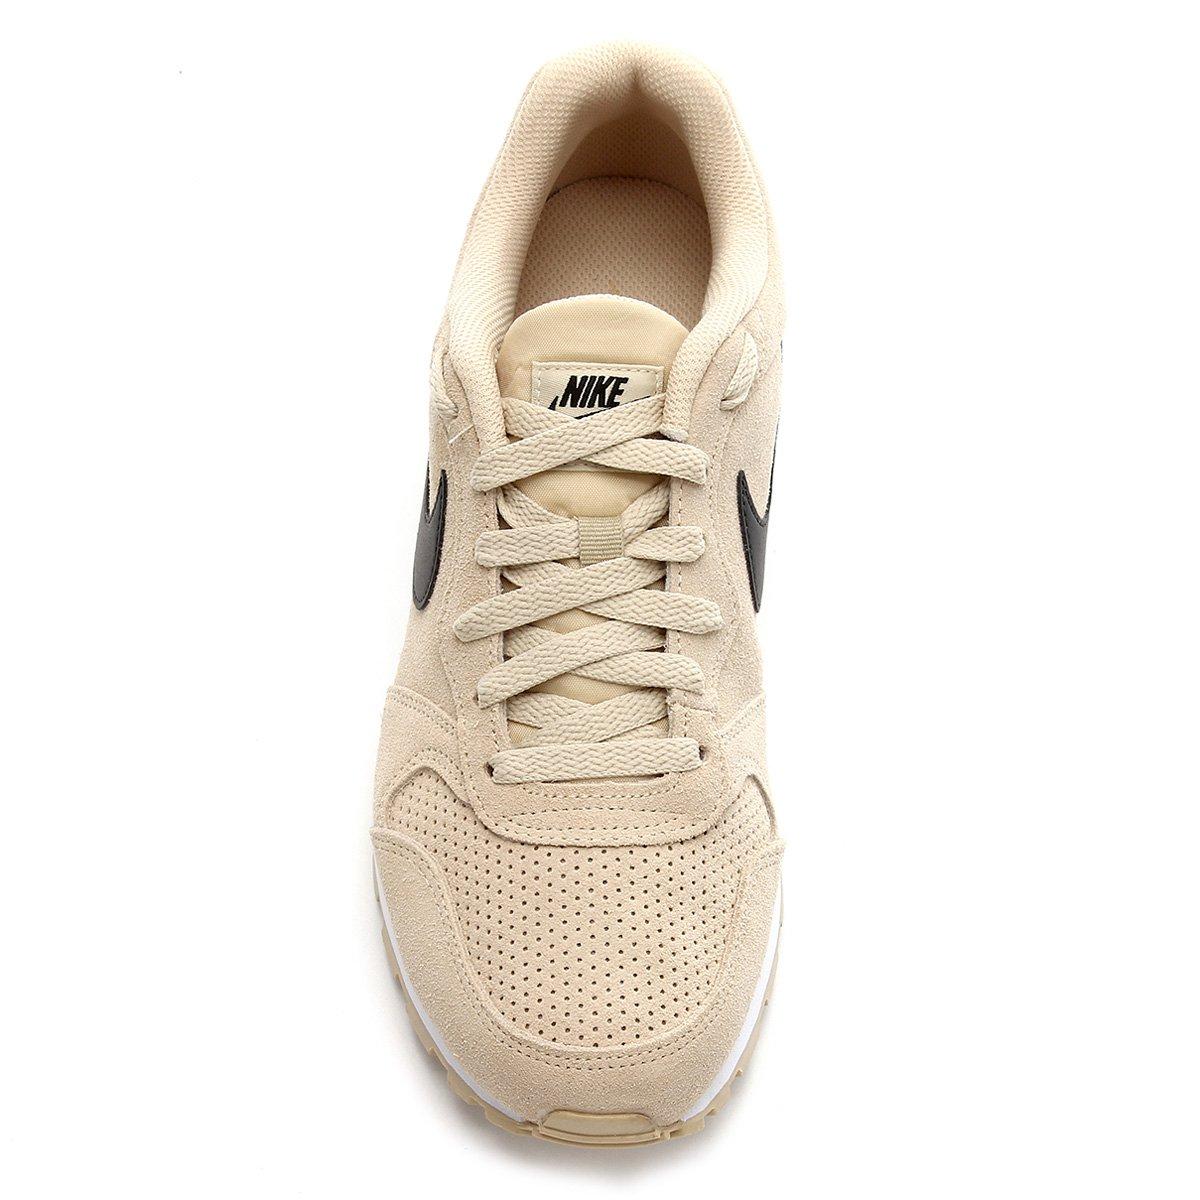 Tênis Nike Md Runner 2 Suede Masculino - Tam: 43 - 2